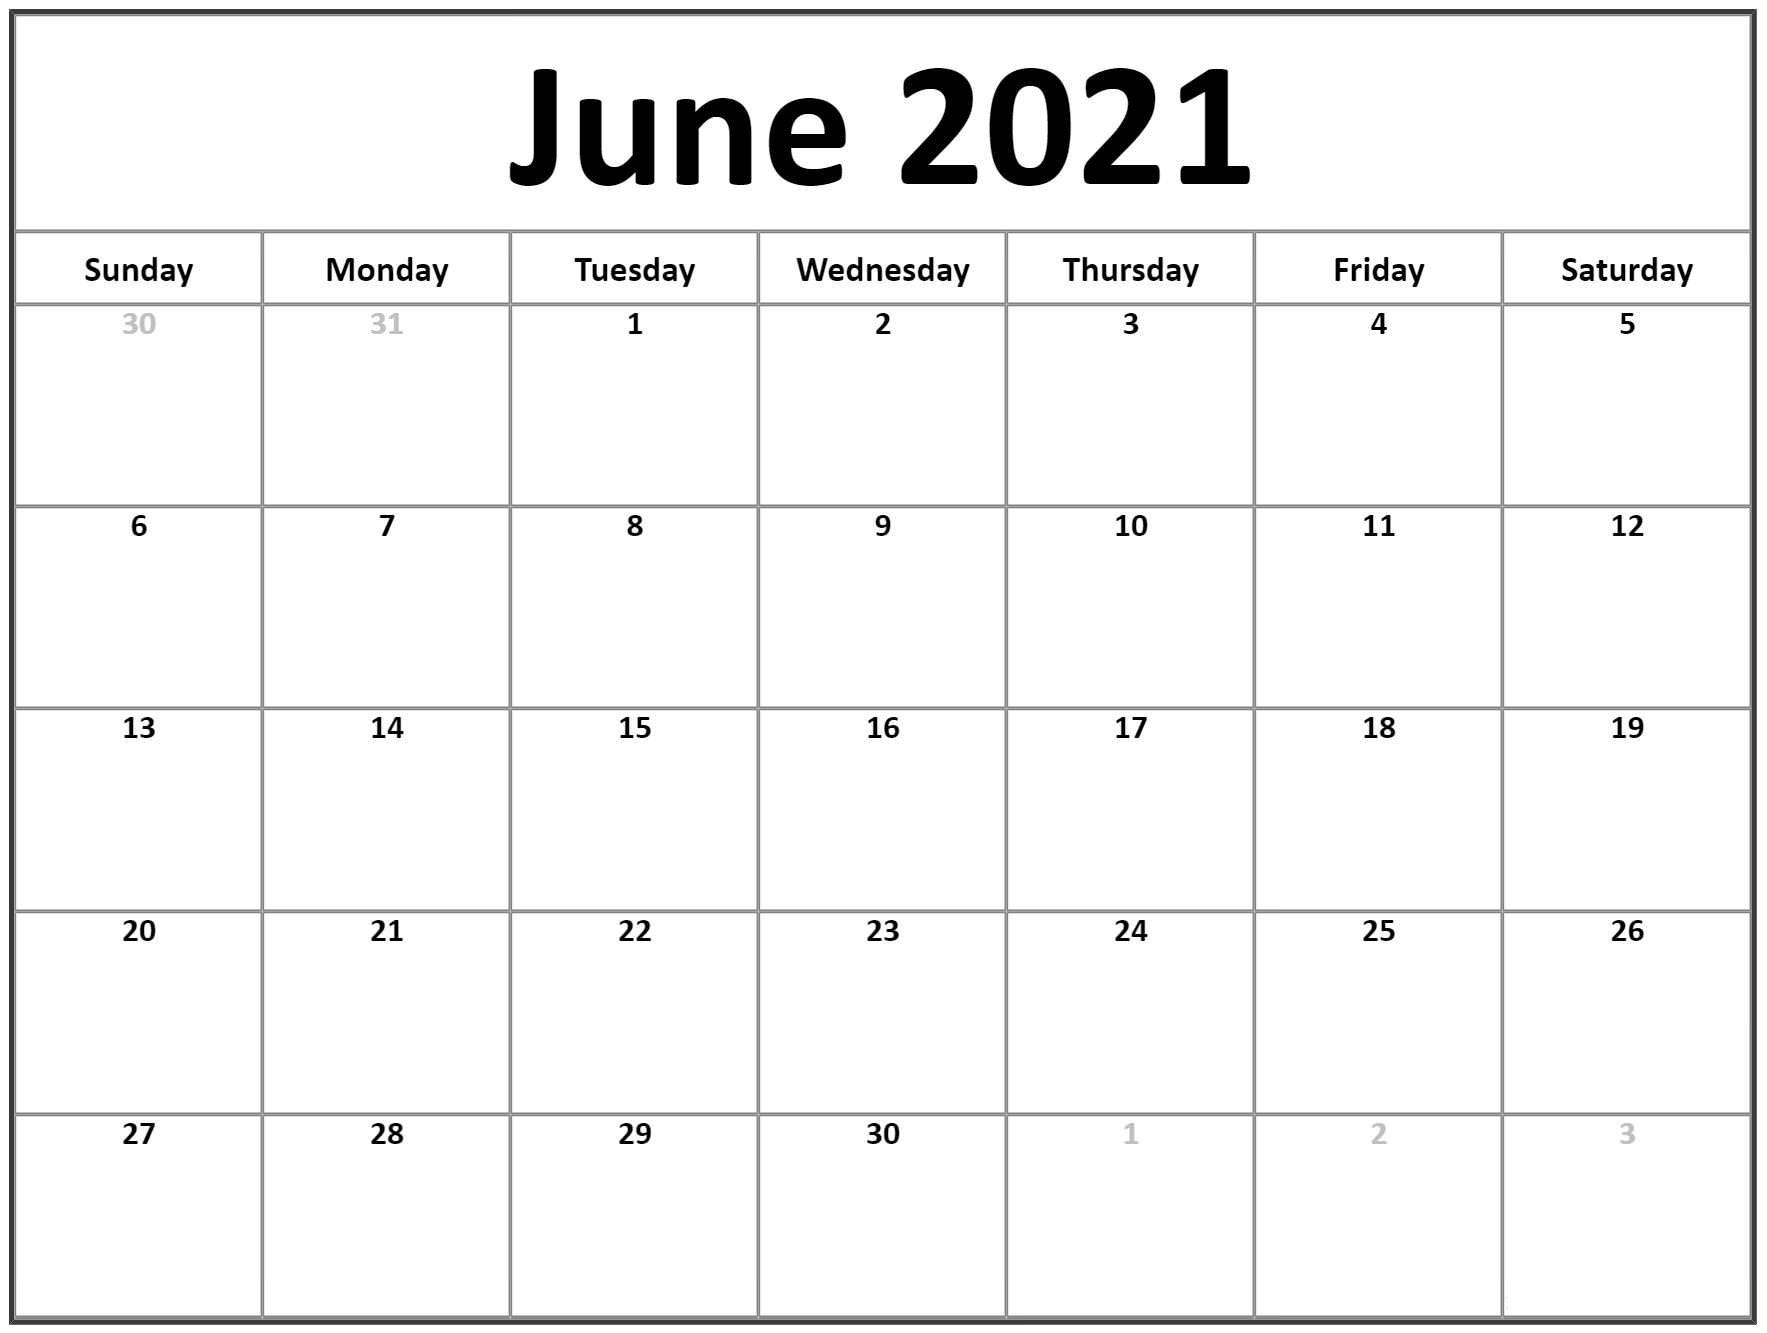 June 2021 Editable Calendar